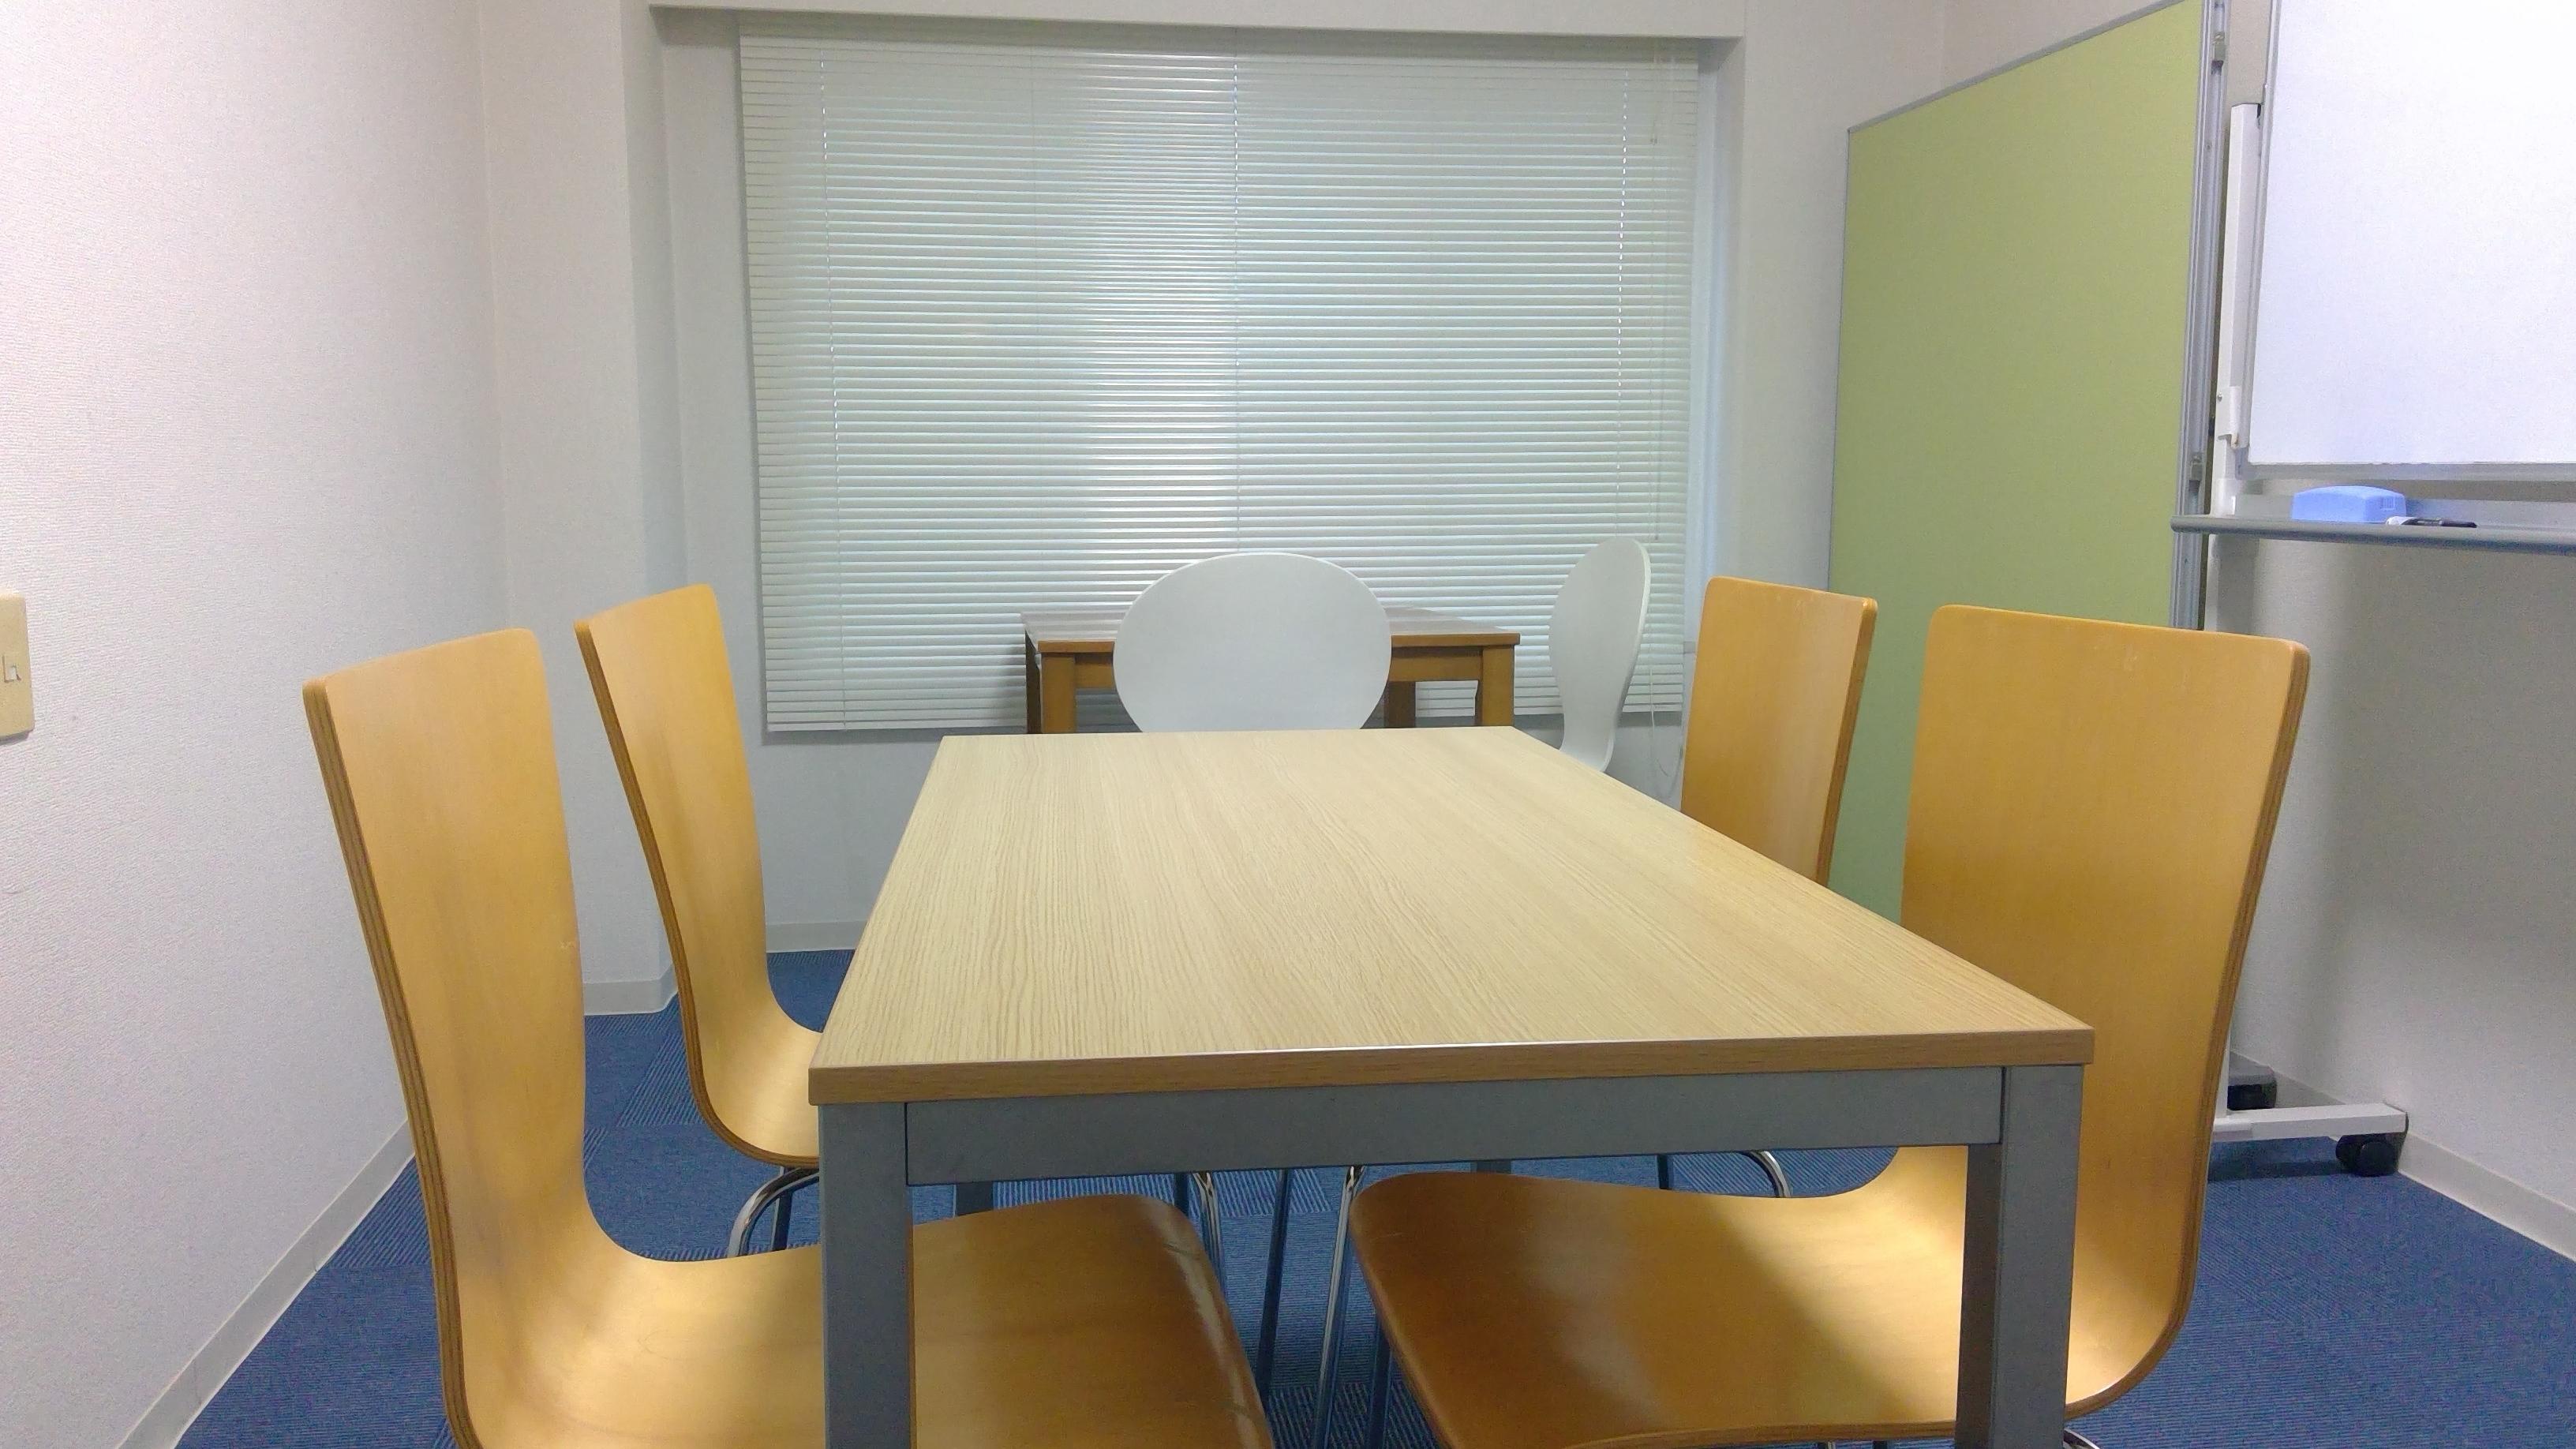 MMクリエイト 多目的スペースの室内の写真